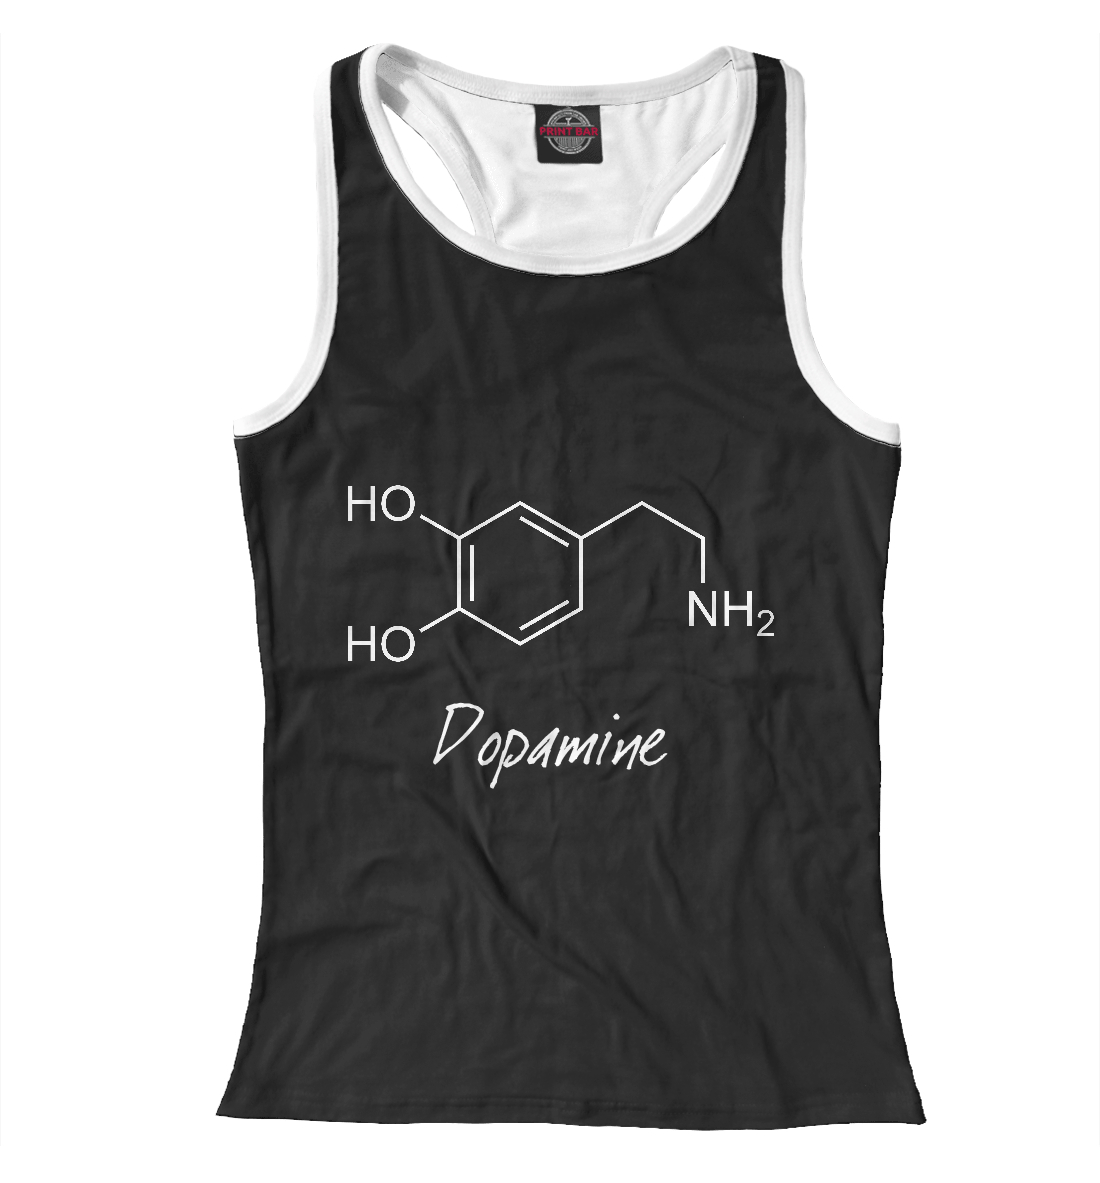 Купить Химия Дофамин, Printbar, Майки борцовки, CHM-824886-mayb-1